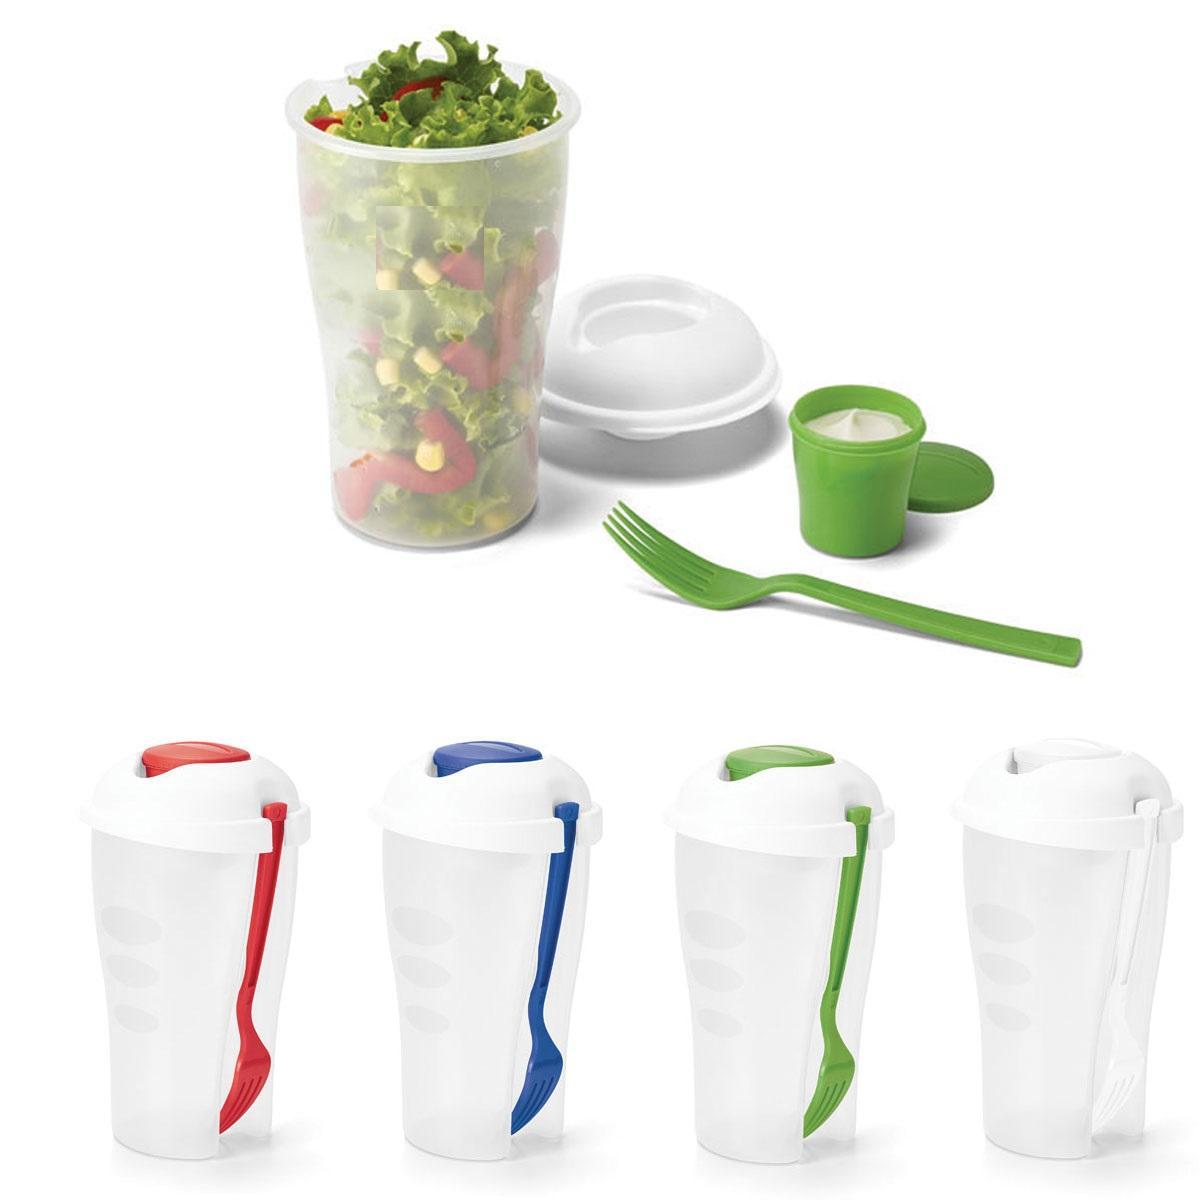 Copo Para Salada E Frutas Branco